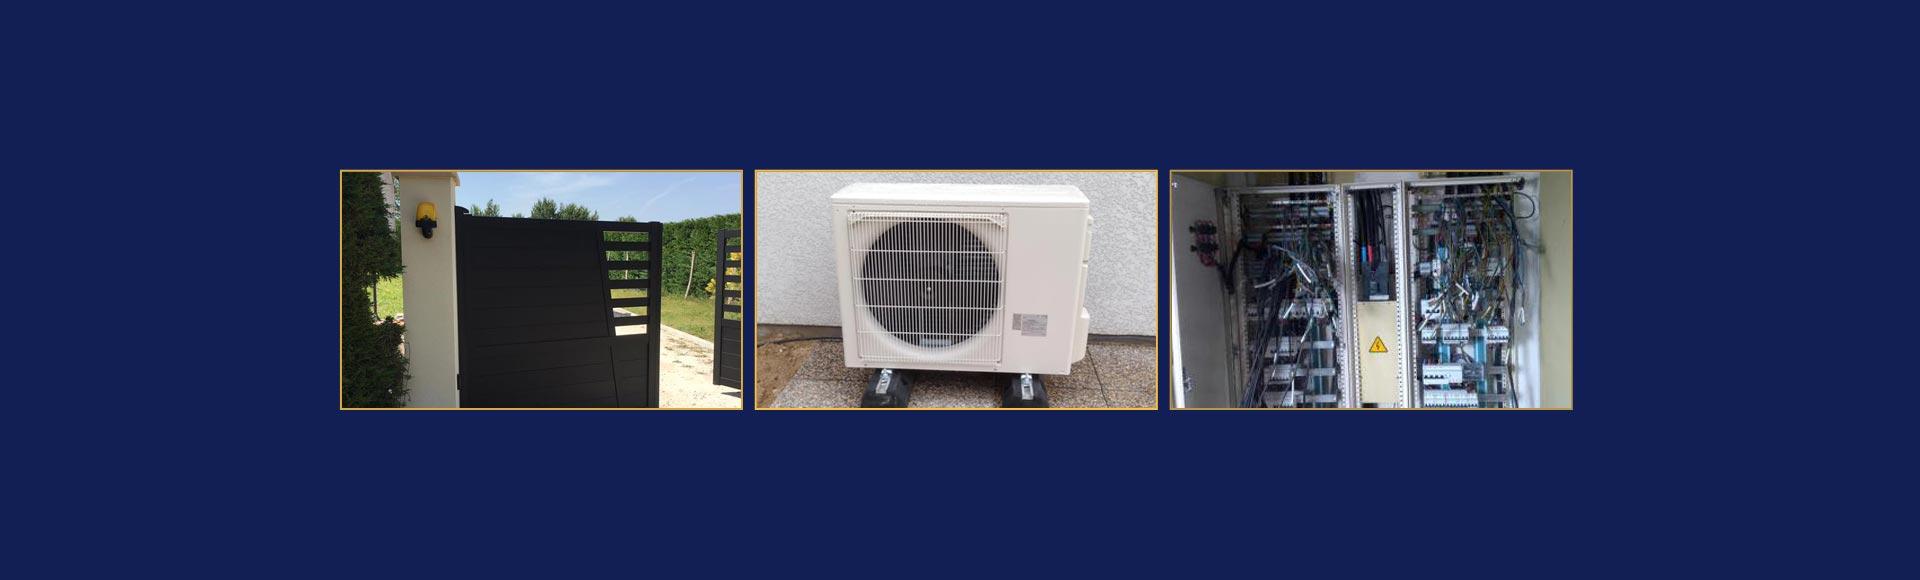 Batiment-tertiaire-industriel-solar-technic